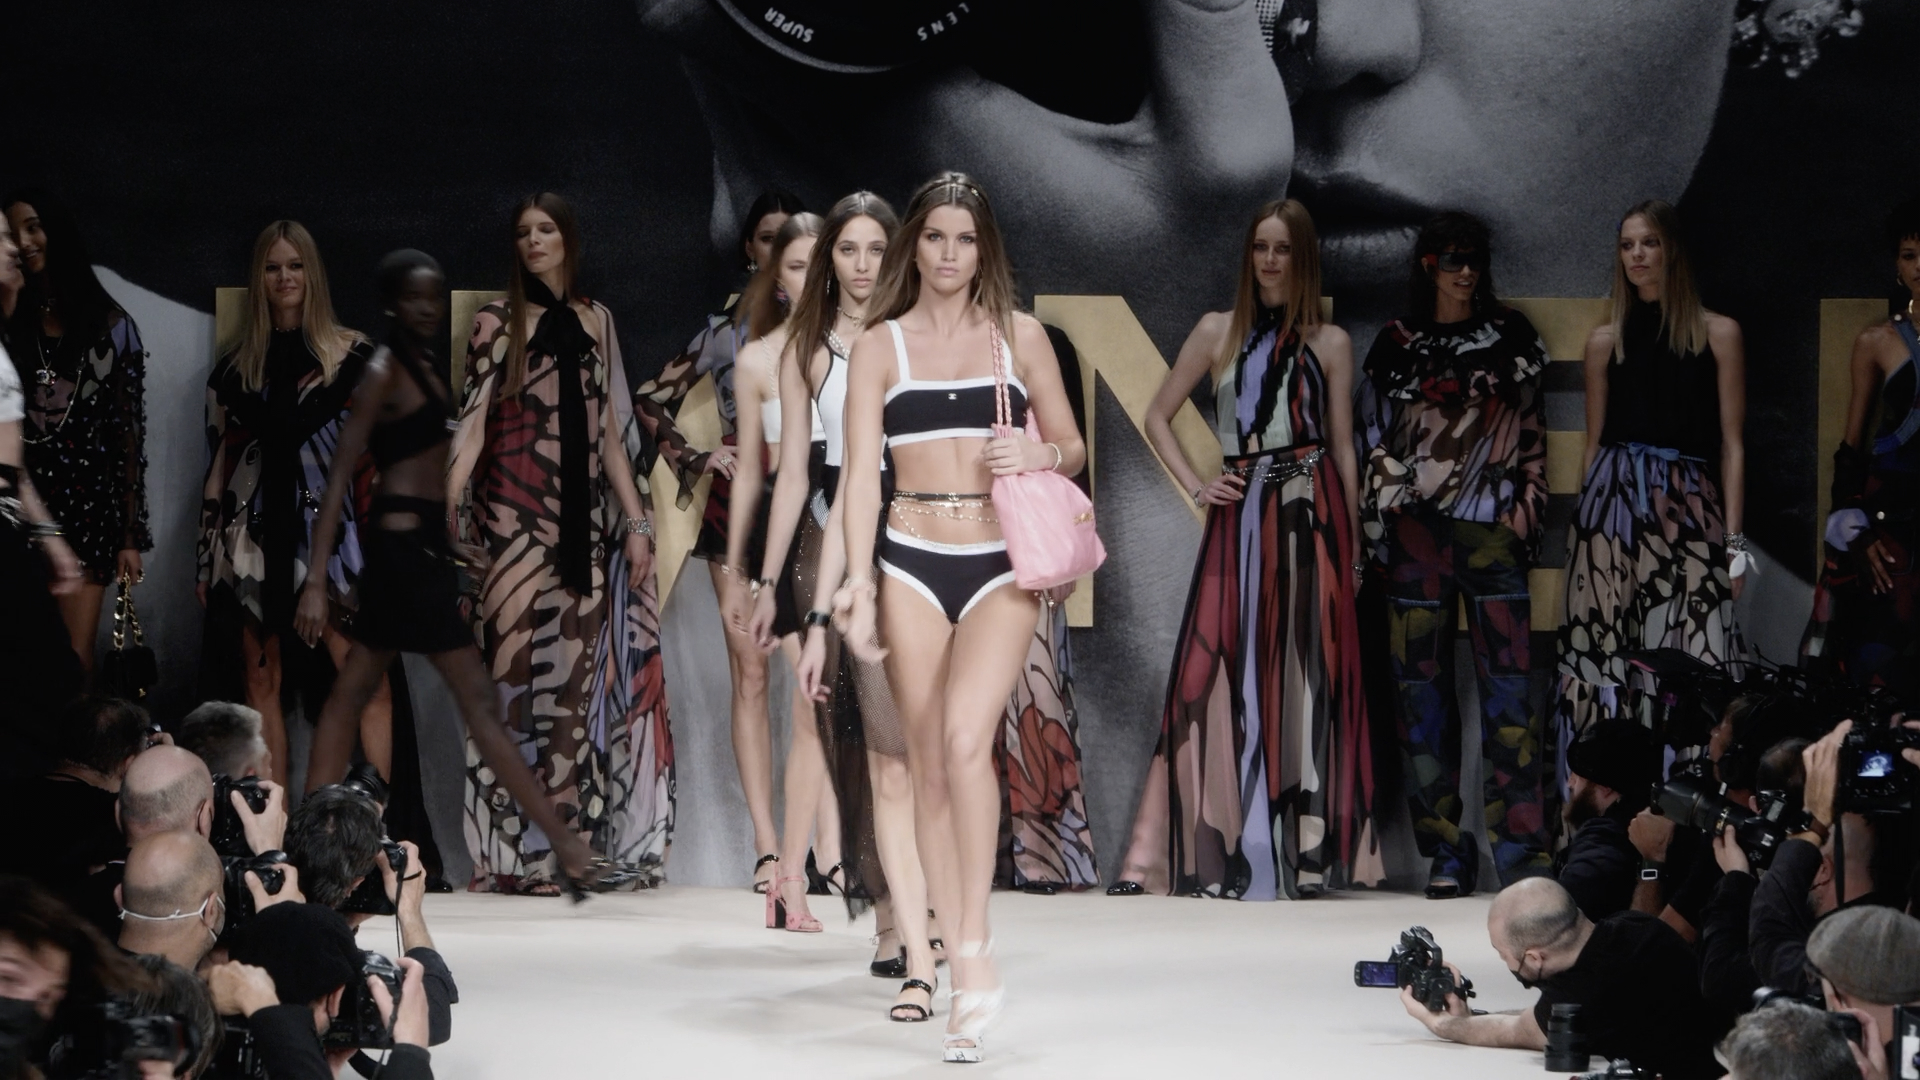 CHANEL cierra la Semana de la Moda de Paris Primavera/Verano 2022